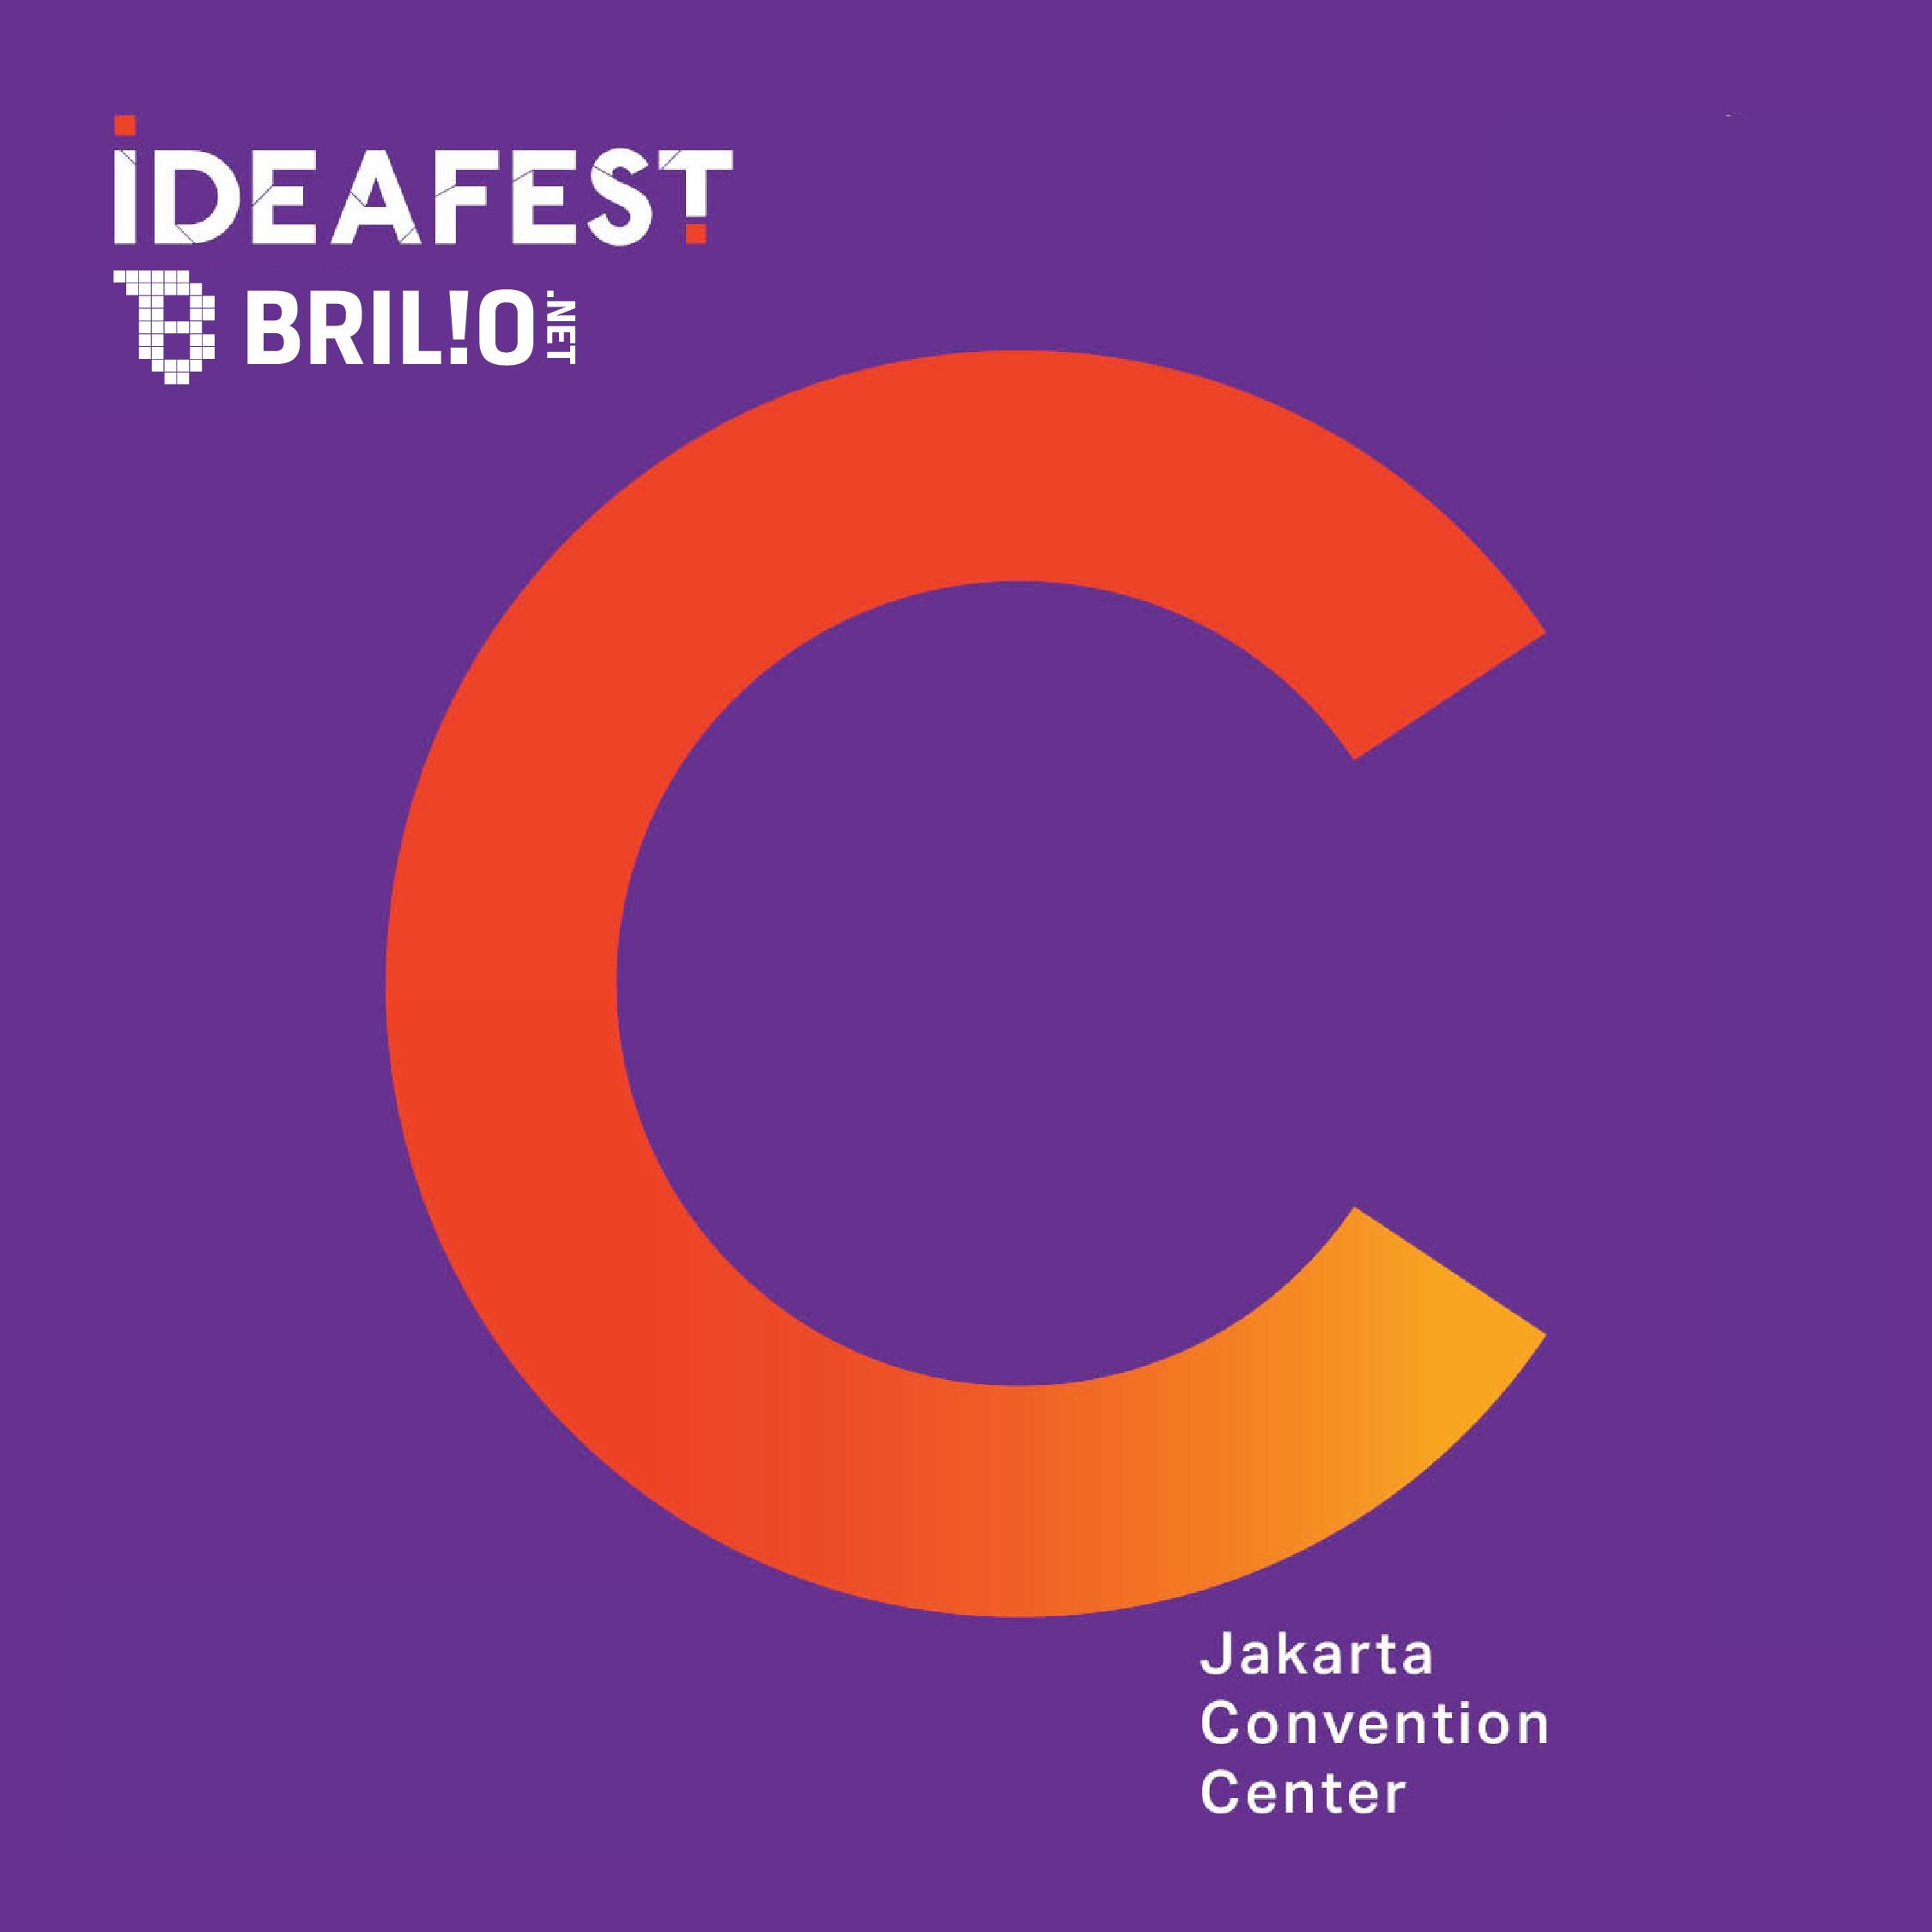 Jangan ngaku anak muda kreatif kalau belum datang ke Ideafest 2018